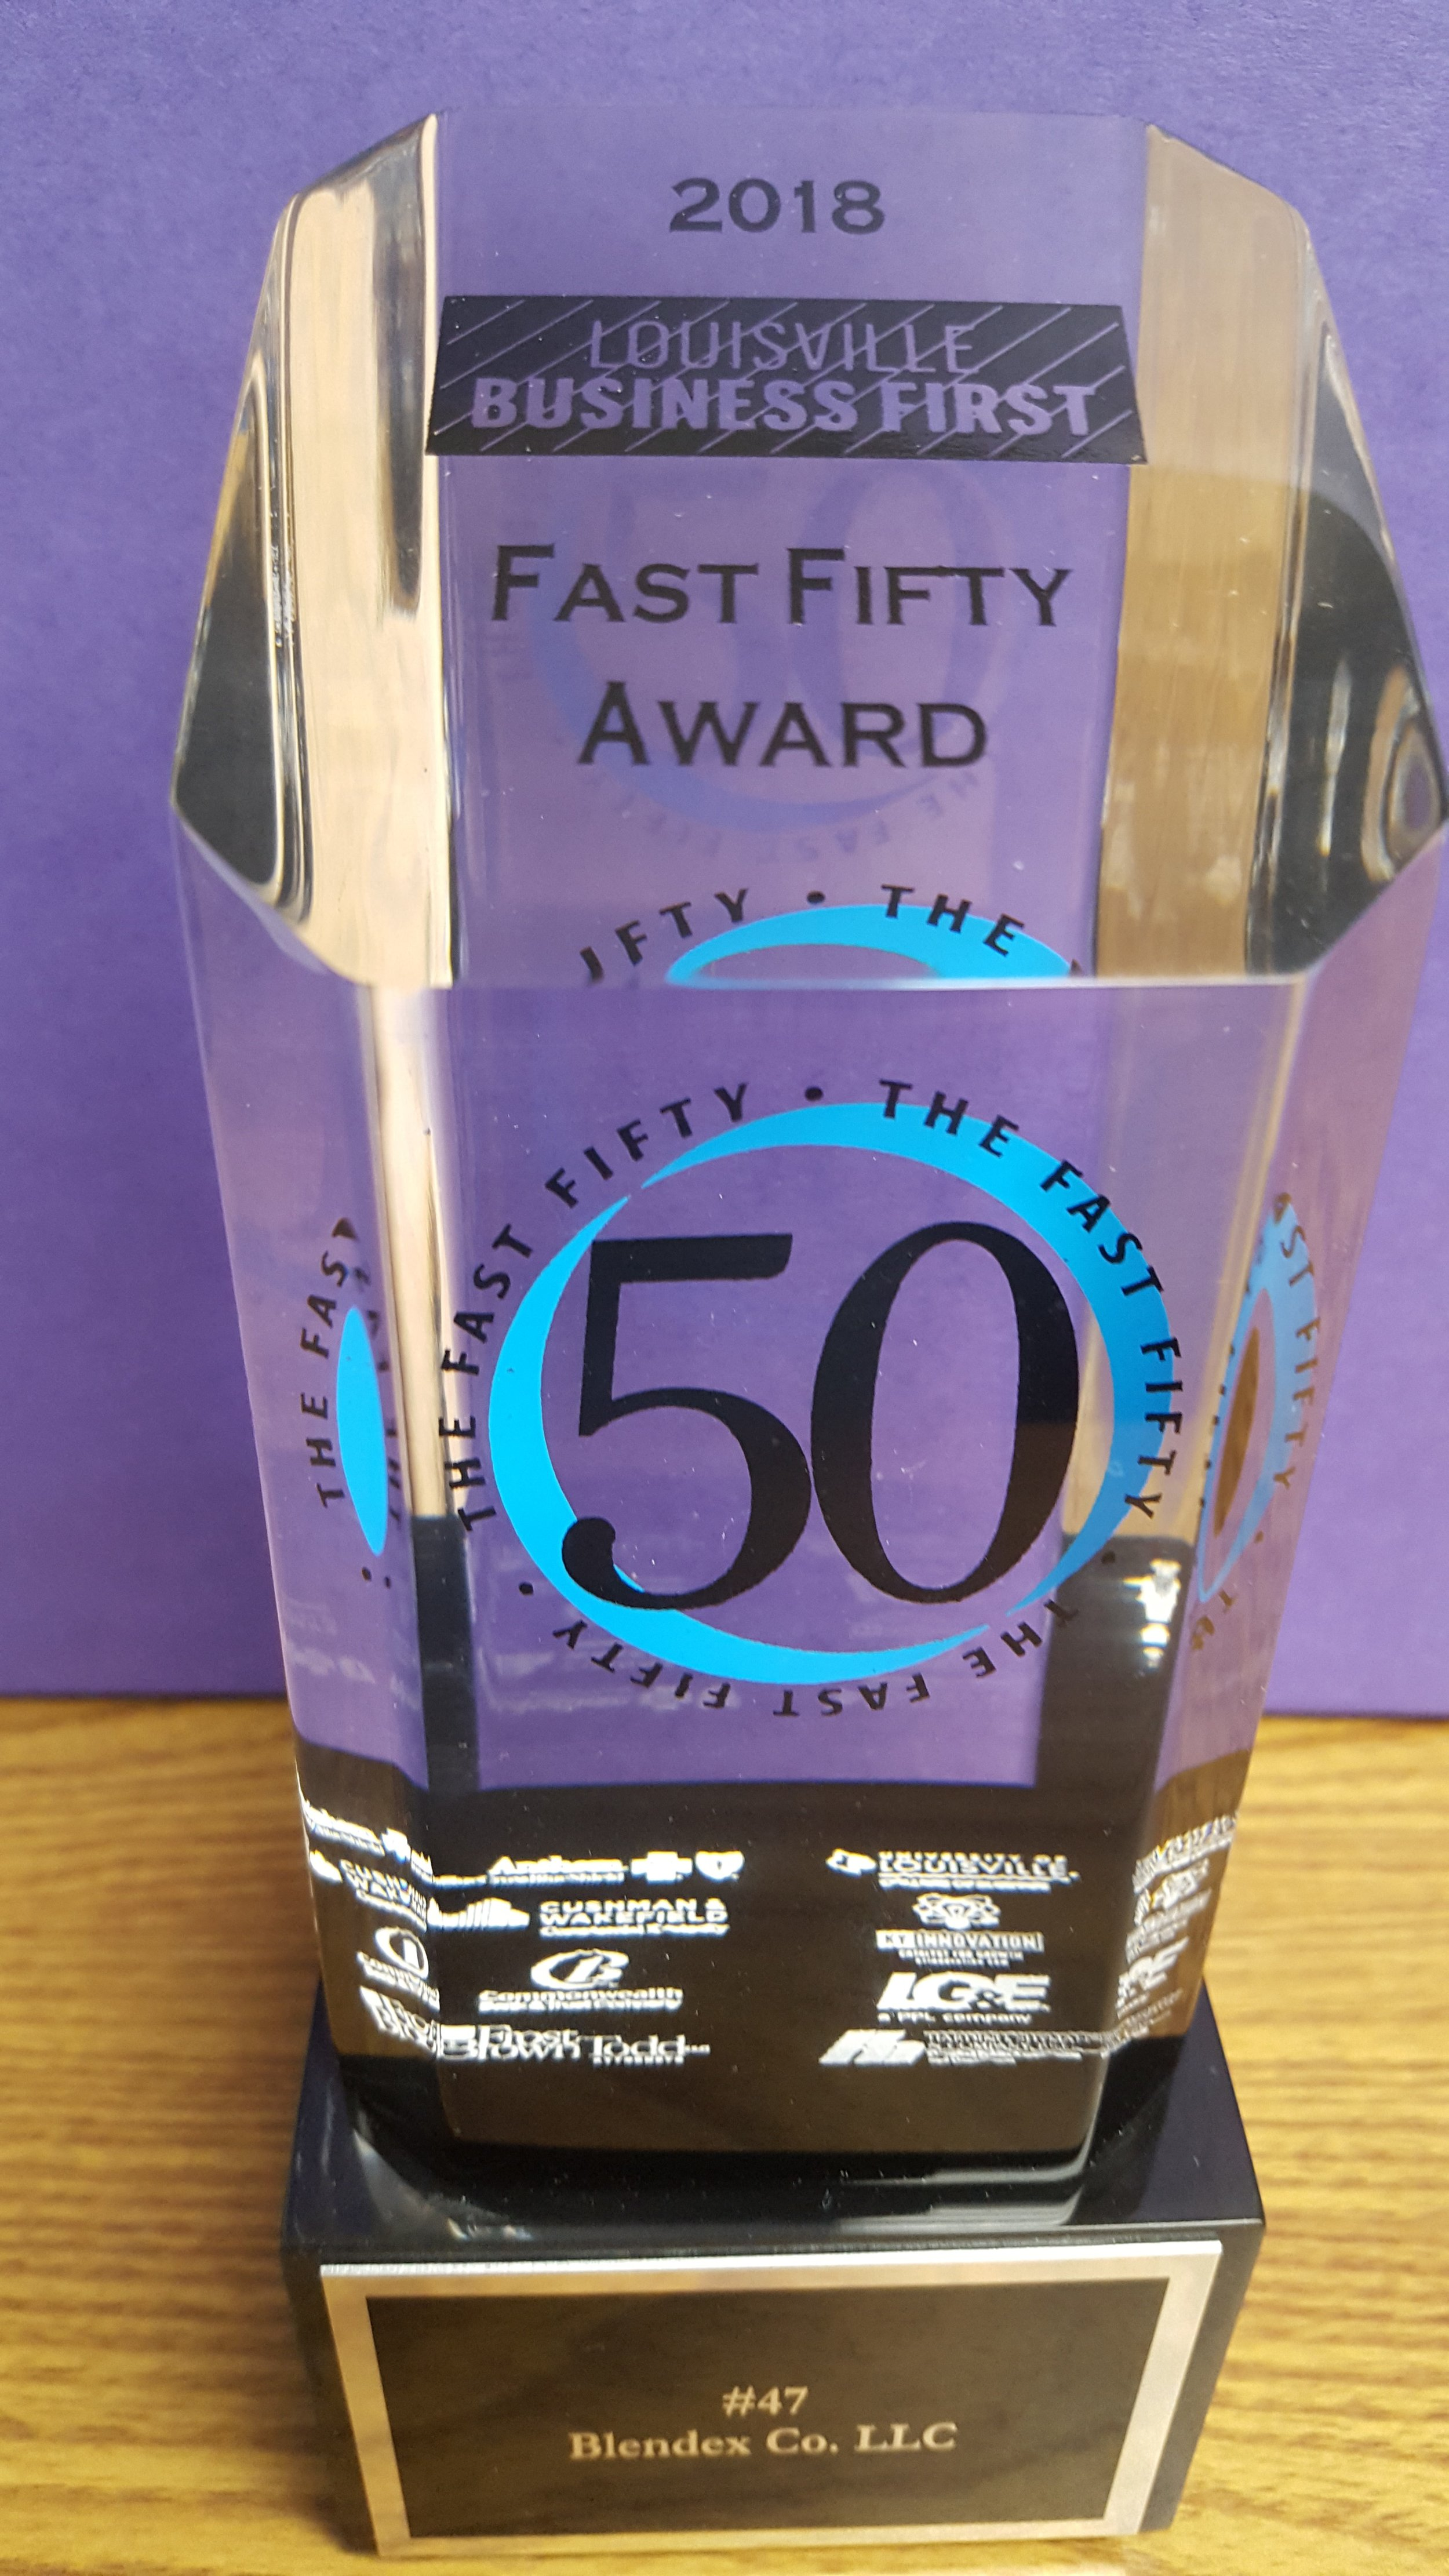 Blendex wins award! -